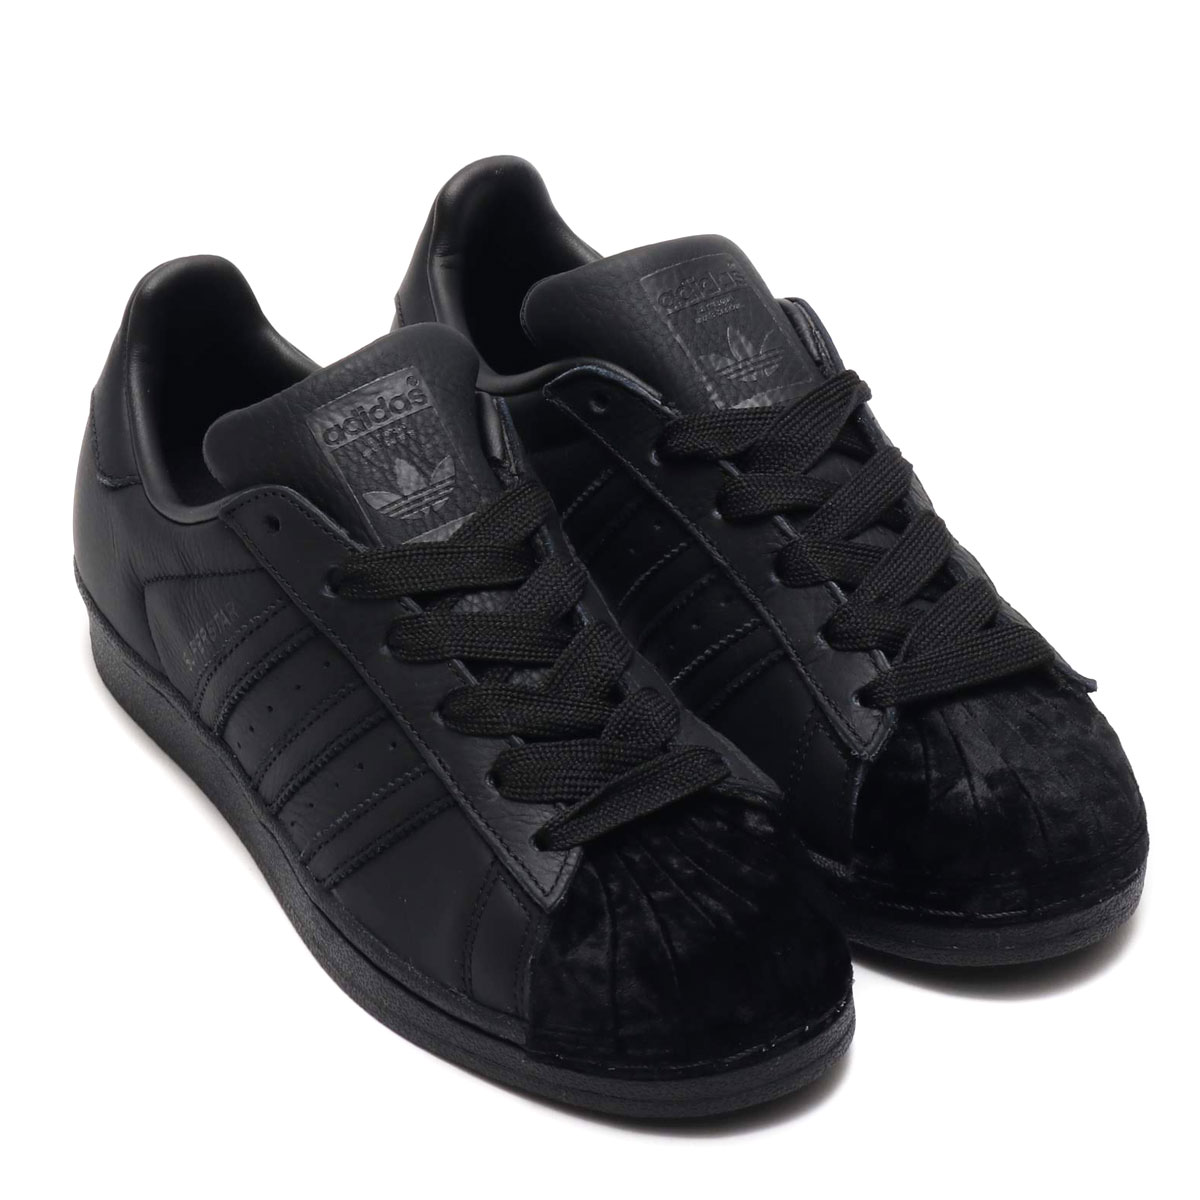 adidas Originals SUPERSTAR W(アディダスオリジナルス スパースター W)CORE BLACK/CORE BLACK/CORE BLACK【メンズ レディース スニーカー】19SS-S